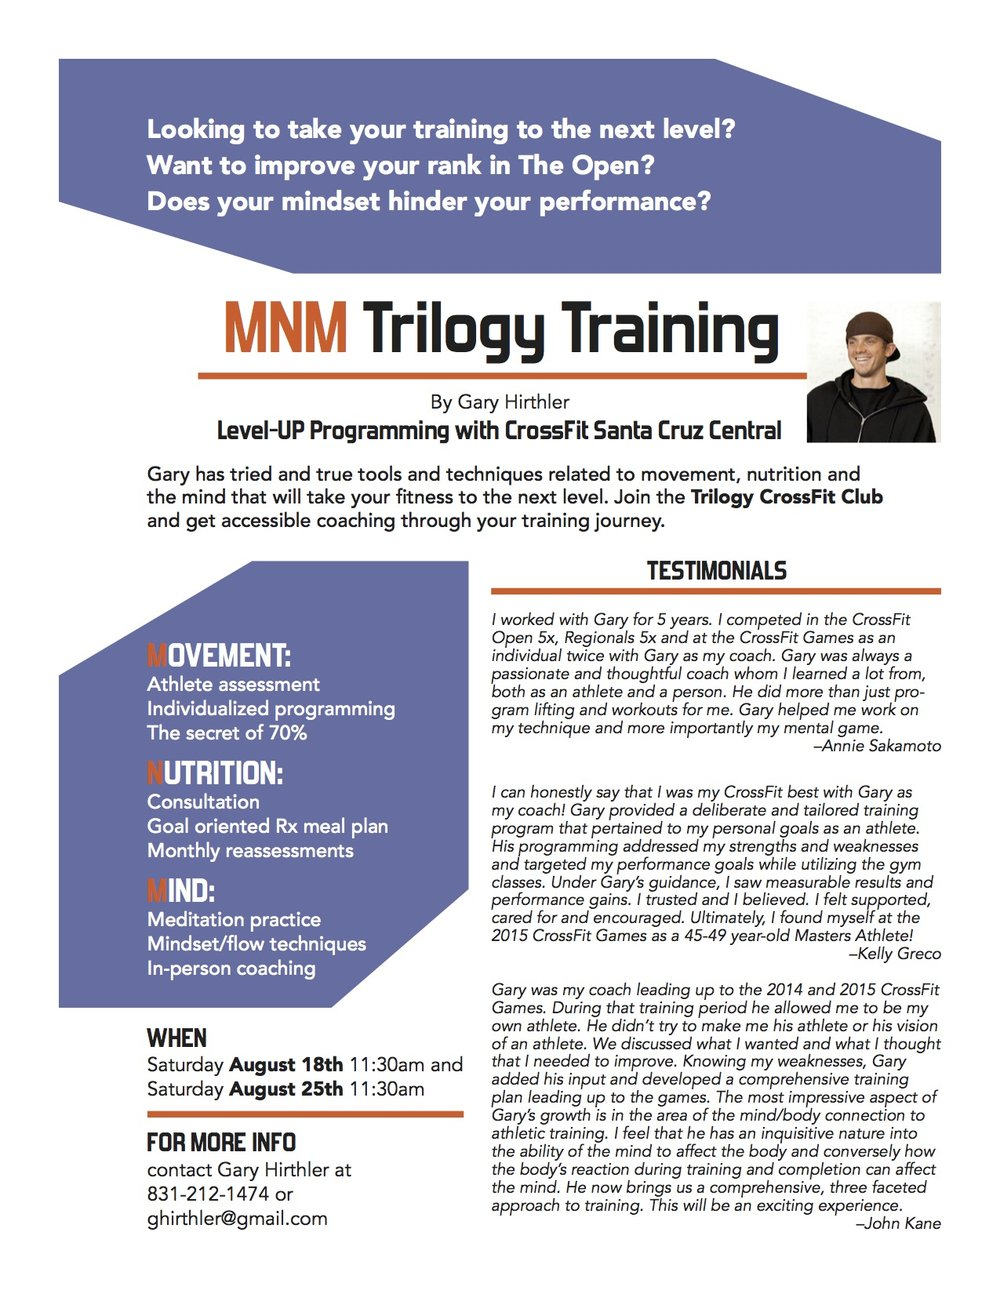 MNM-Trilogy-flyer (2).jpg